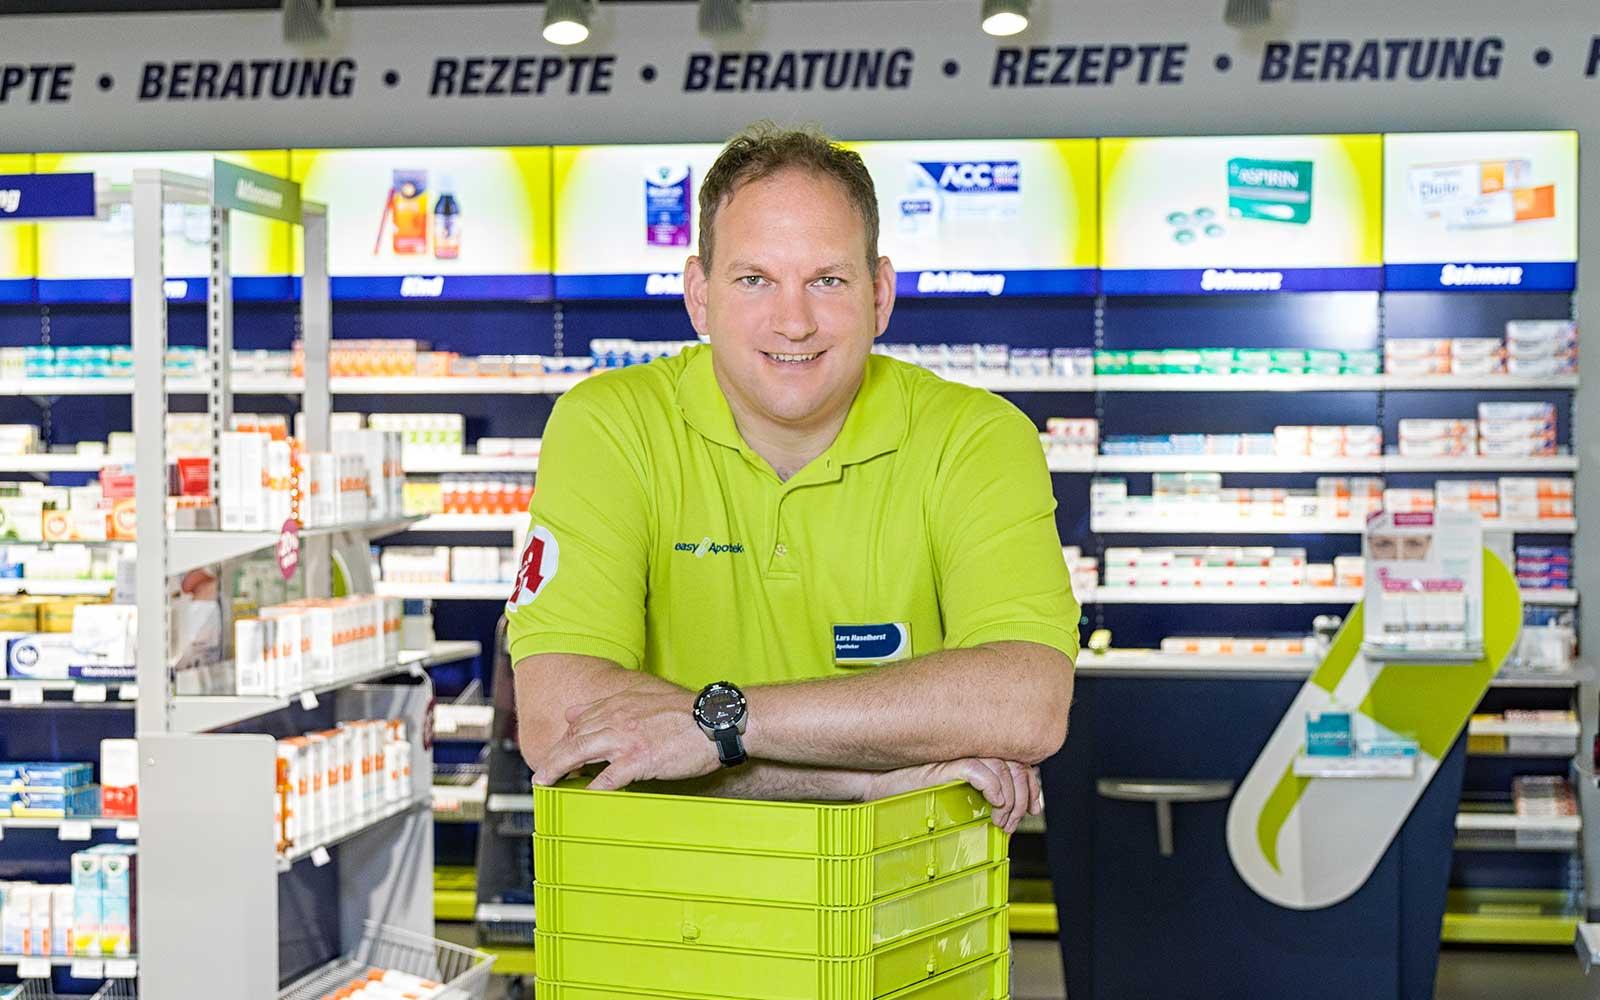 Apotheker Lars Haselhorst in seiner easyApotheke in Wolfsburg